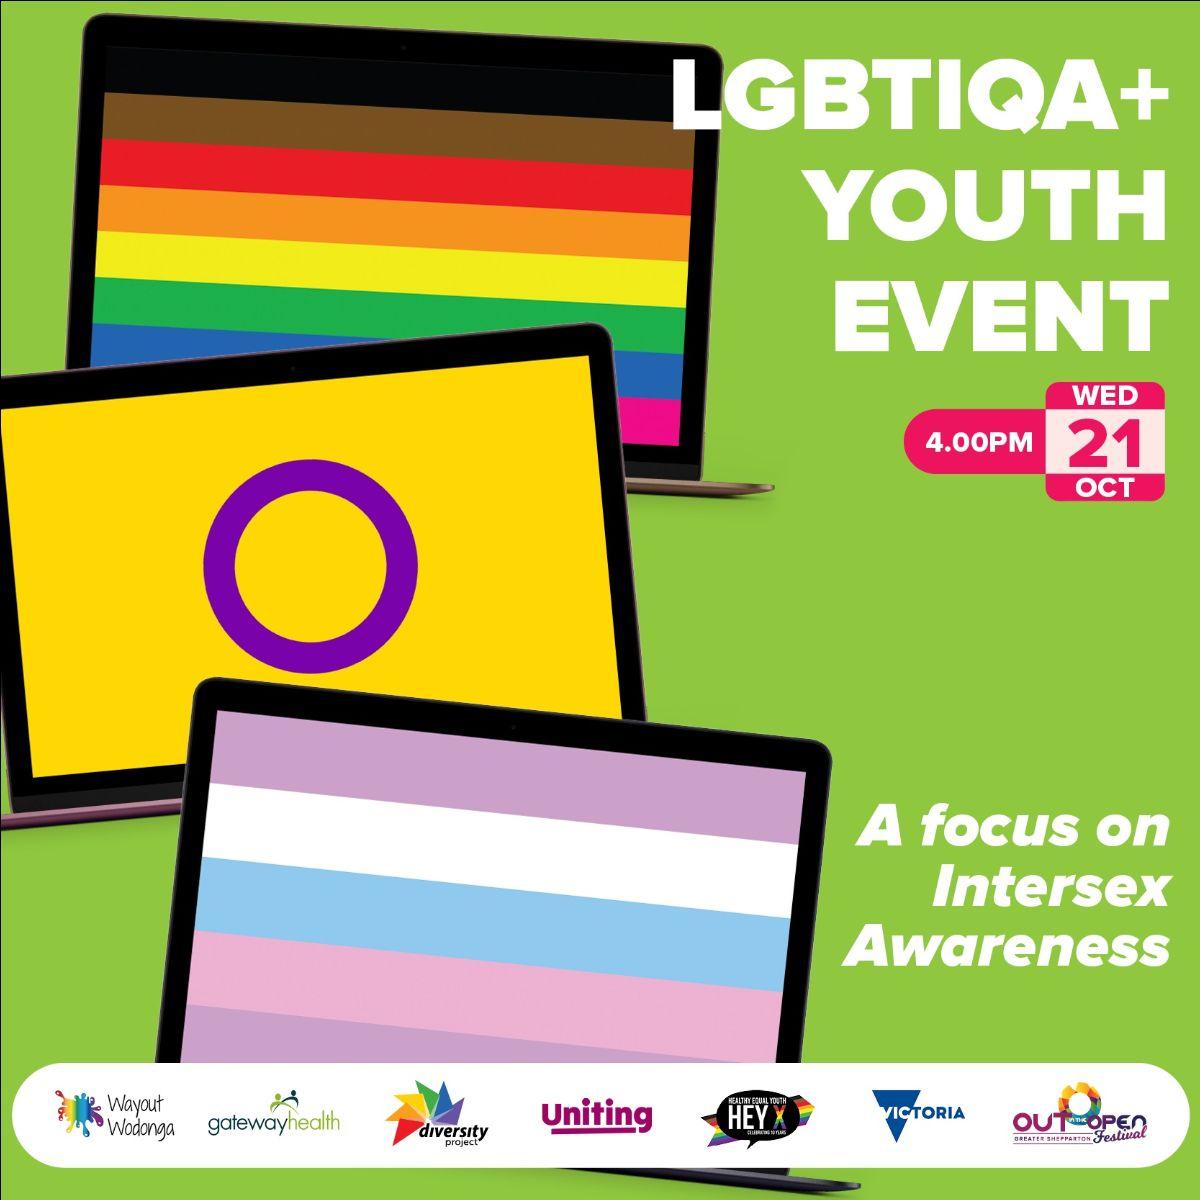 Graphic poster showing rainbow pride flag, intersex pride flag and bigender pride flag